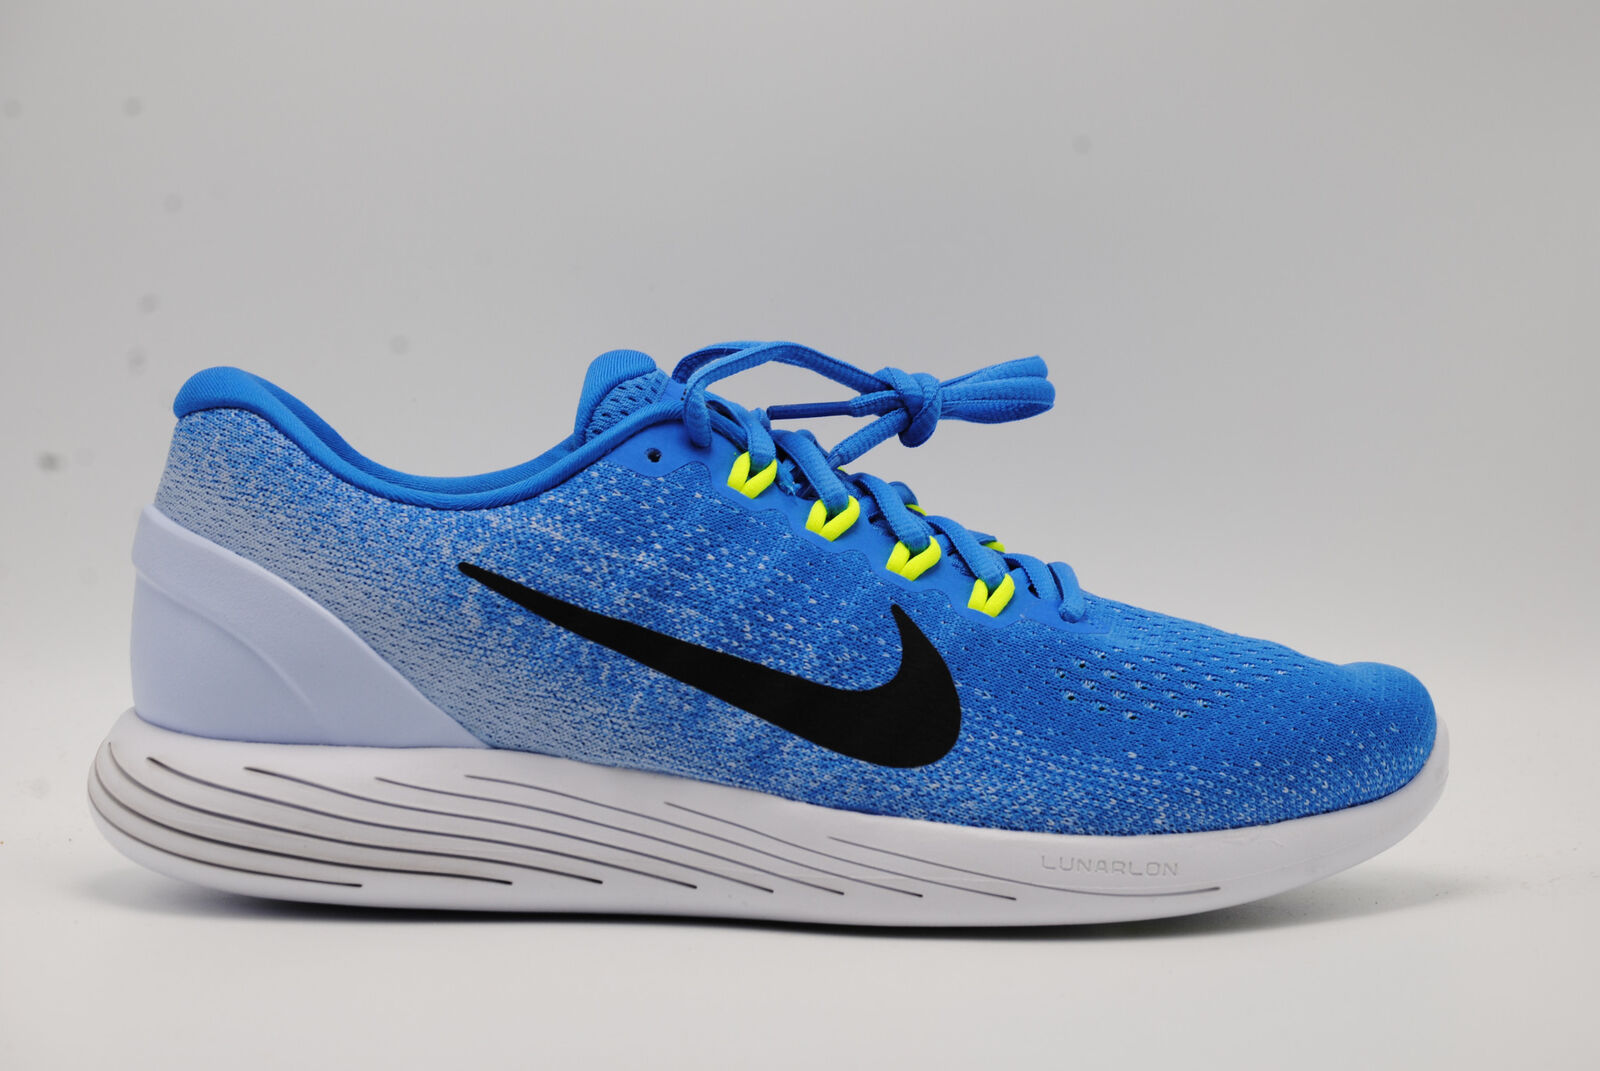 Nike Lunarglide 9 Men's running shoes 904715 401 Multiple sizes